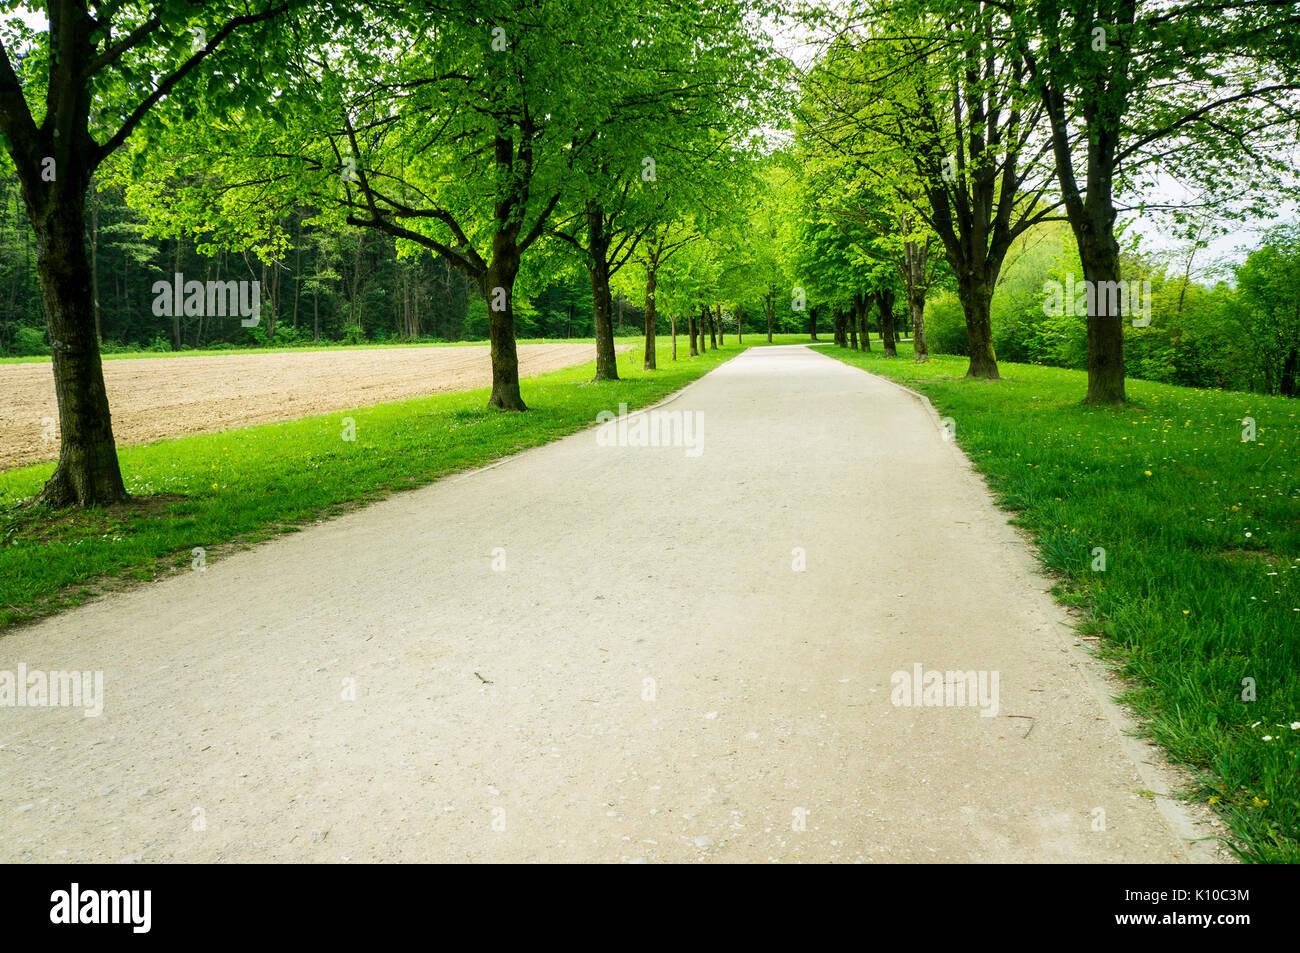 The Trail of Remembrance and Comradeship in Ljubljana, Slovenia - Stock Image